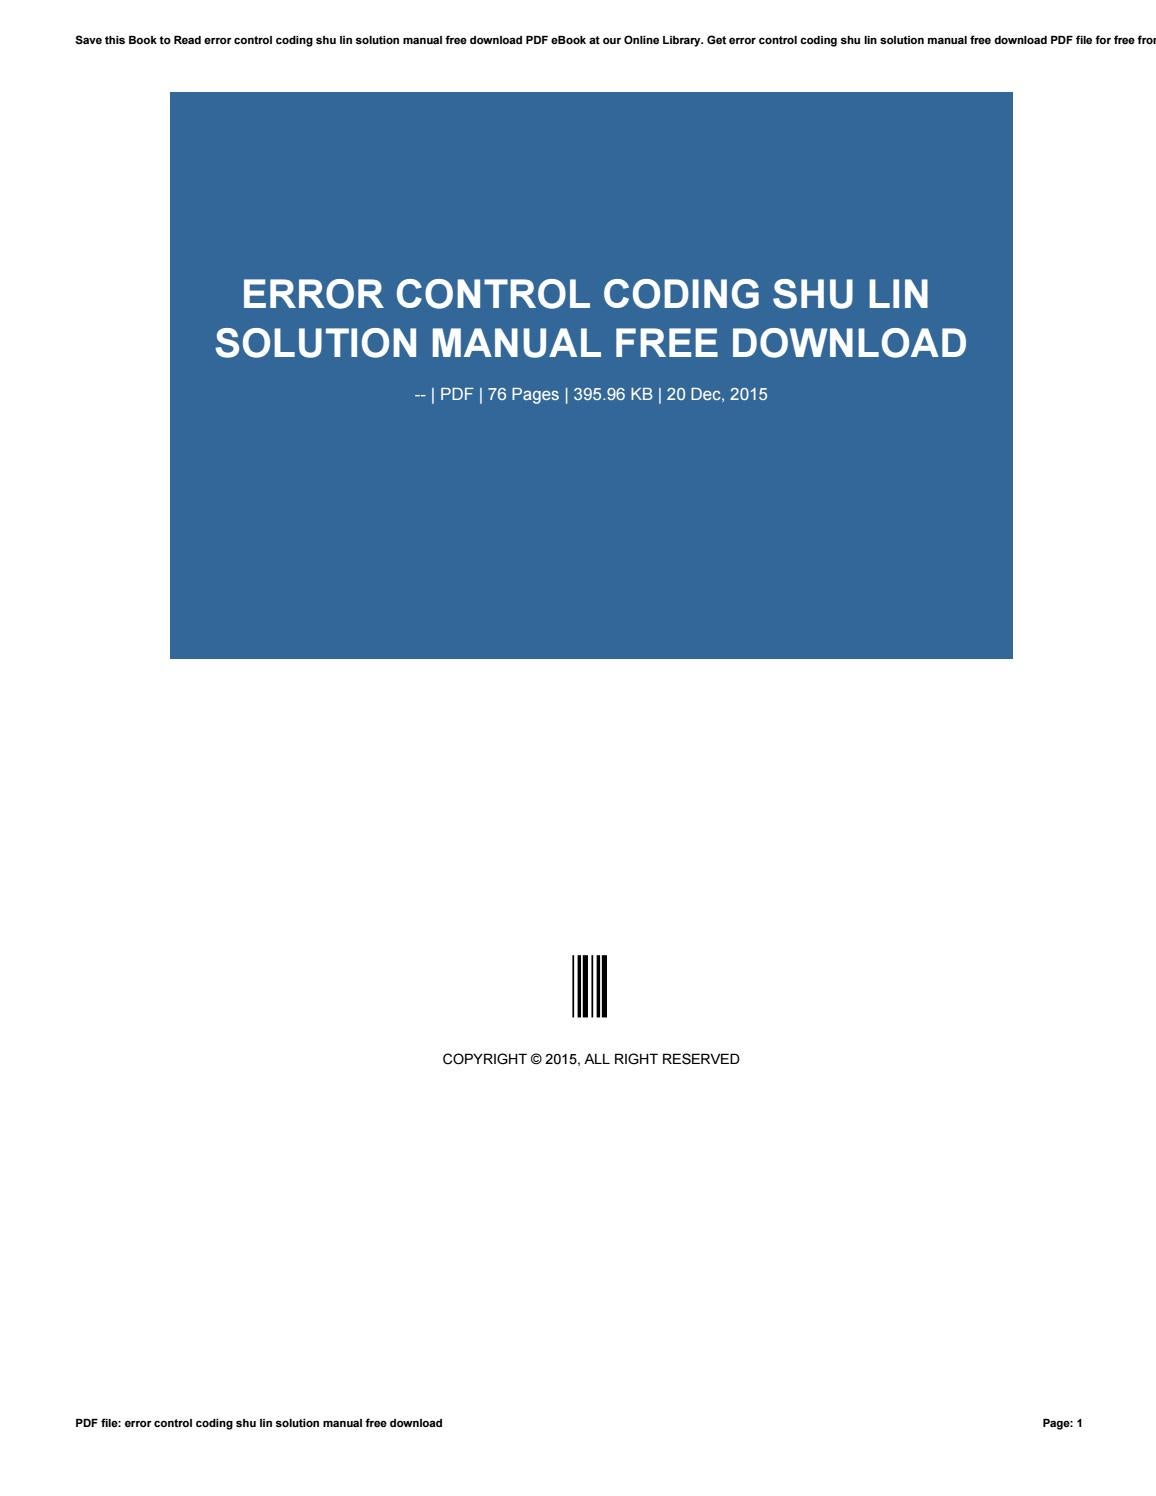 Error Control Coding Shu Lin Solution Manual Free Download by  corneliusholland834 - issuu